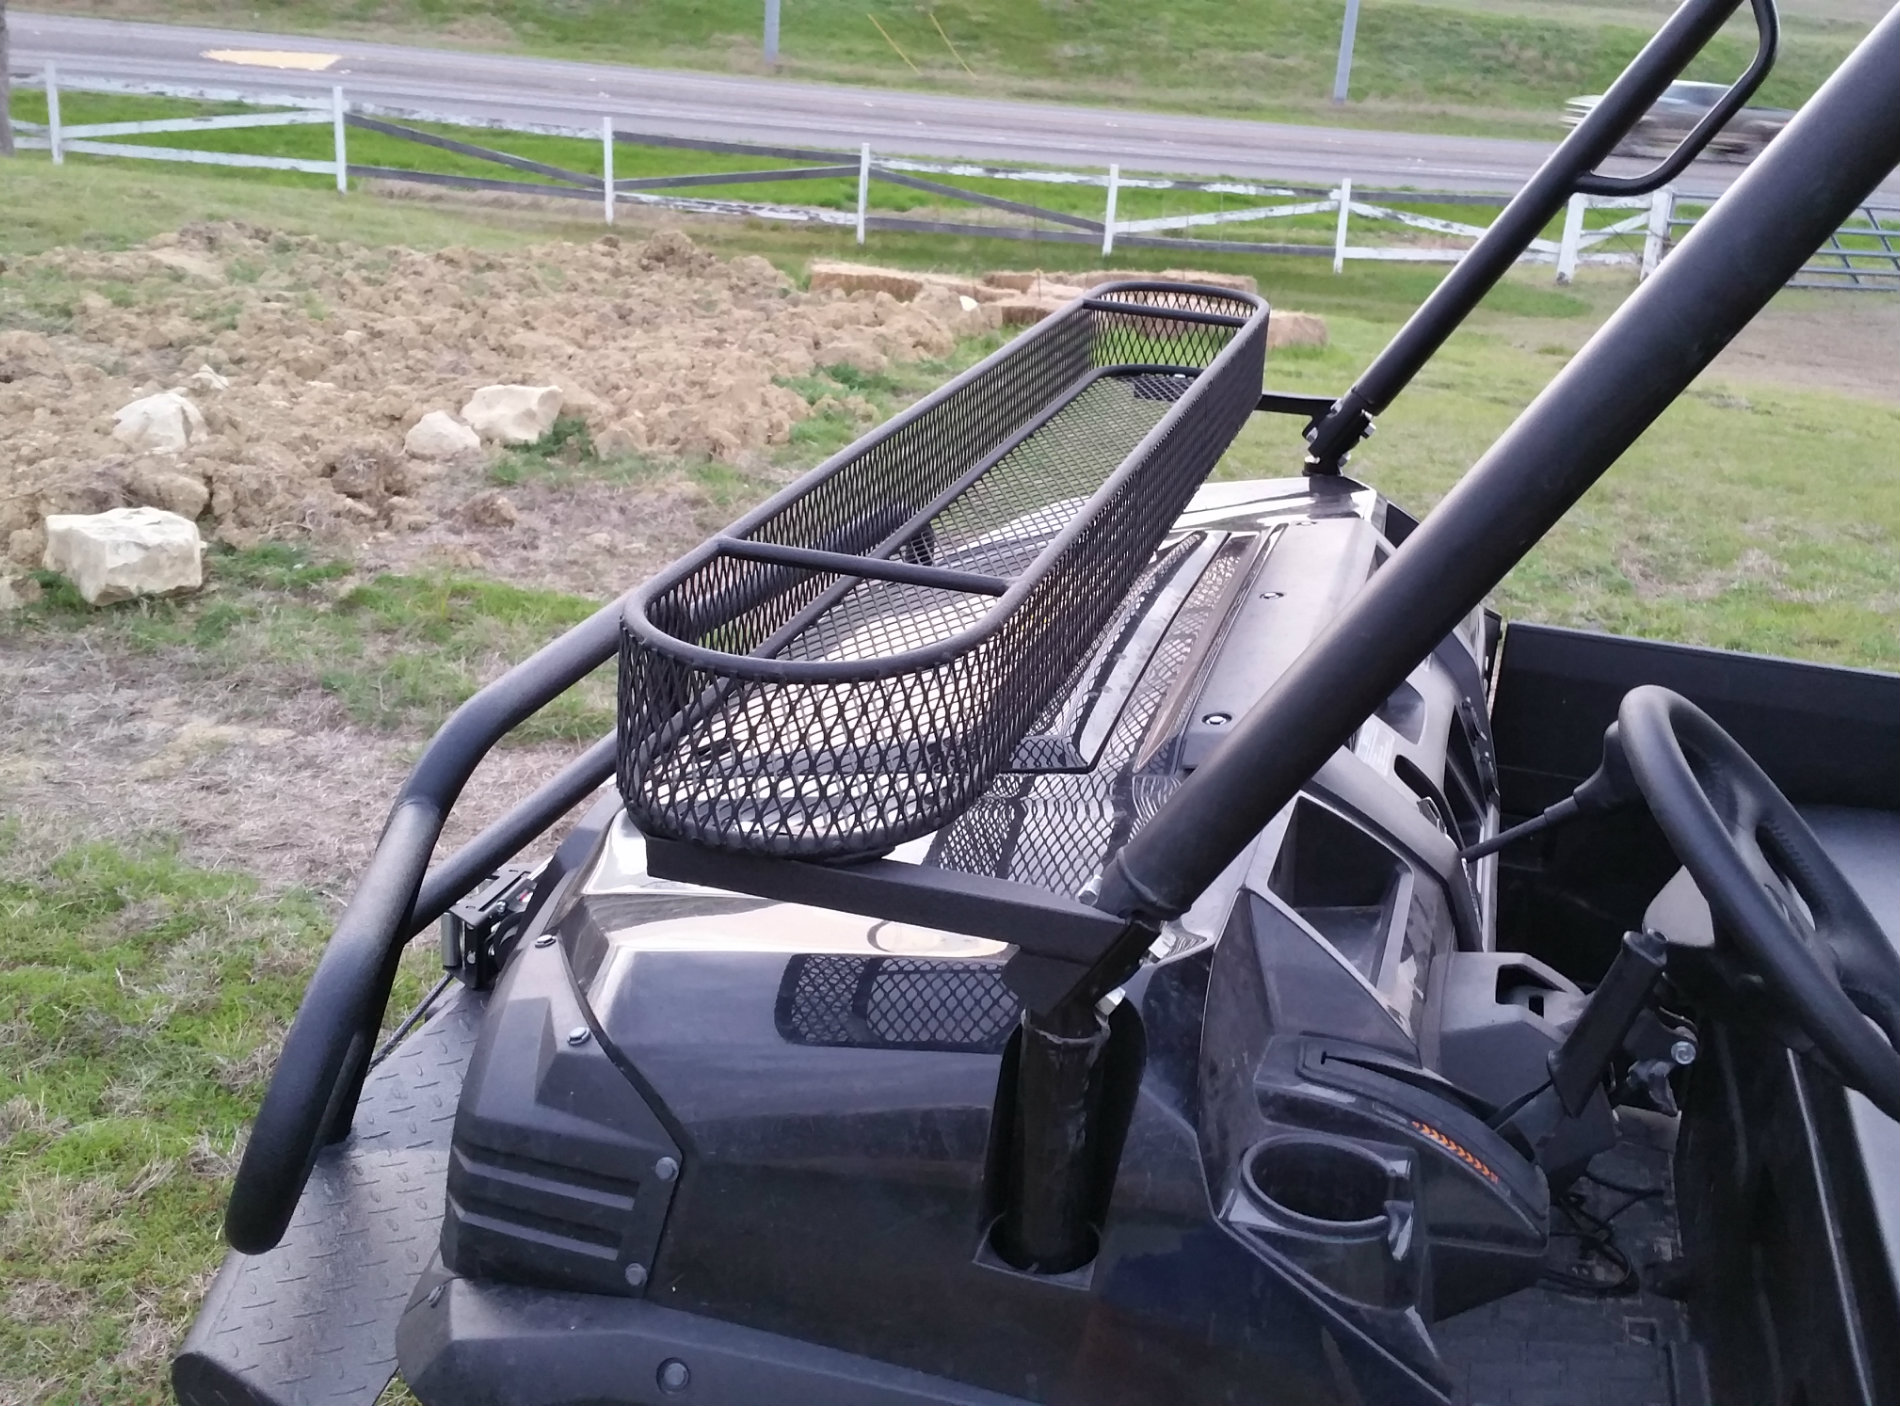 mule-pro-utv-front-storage-basket.jpg